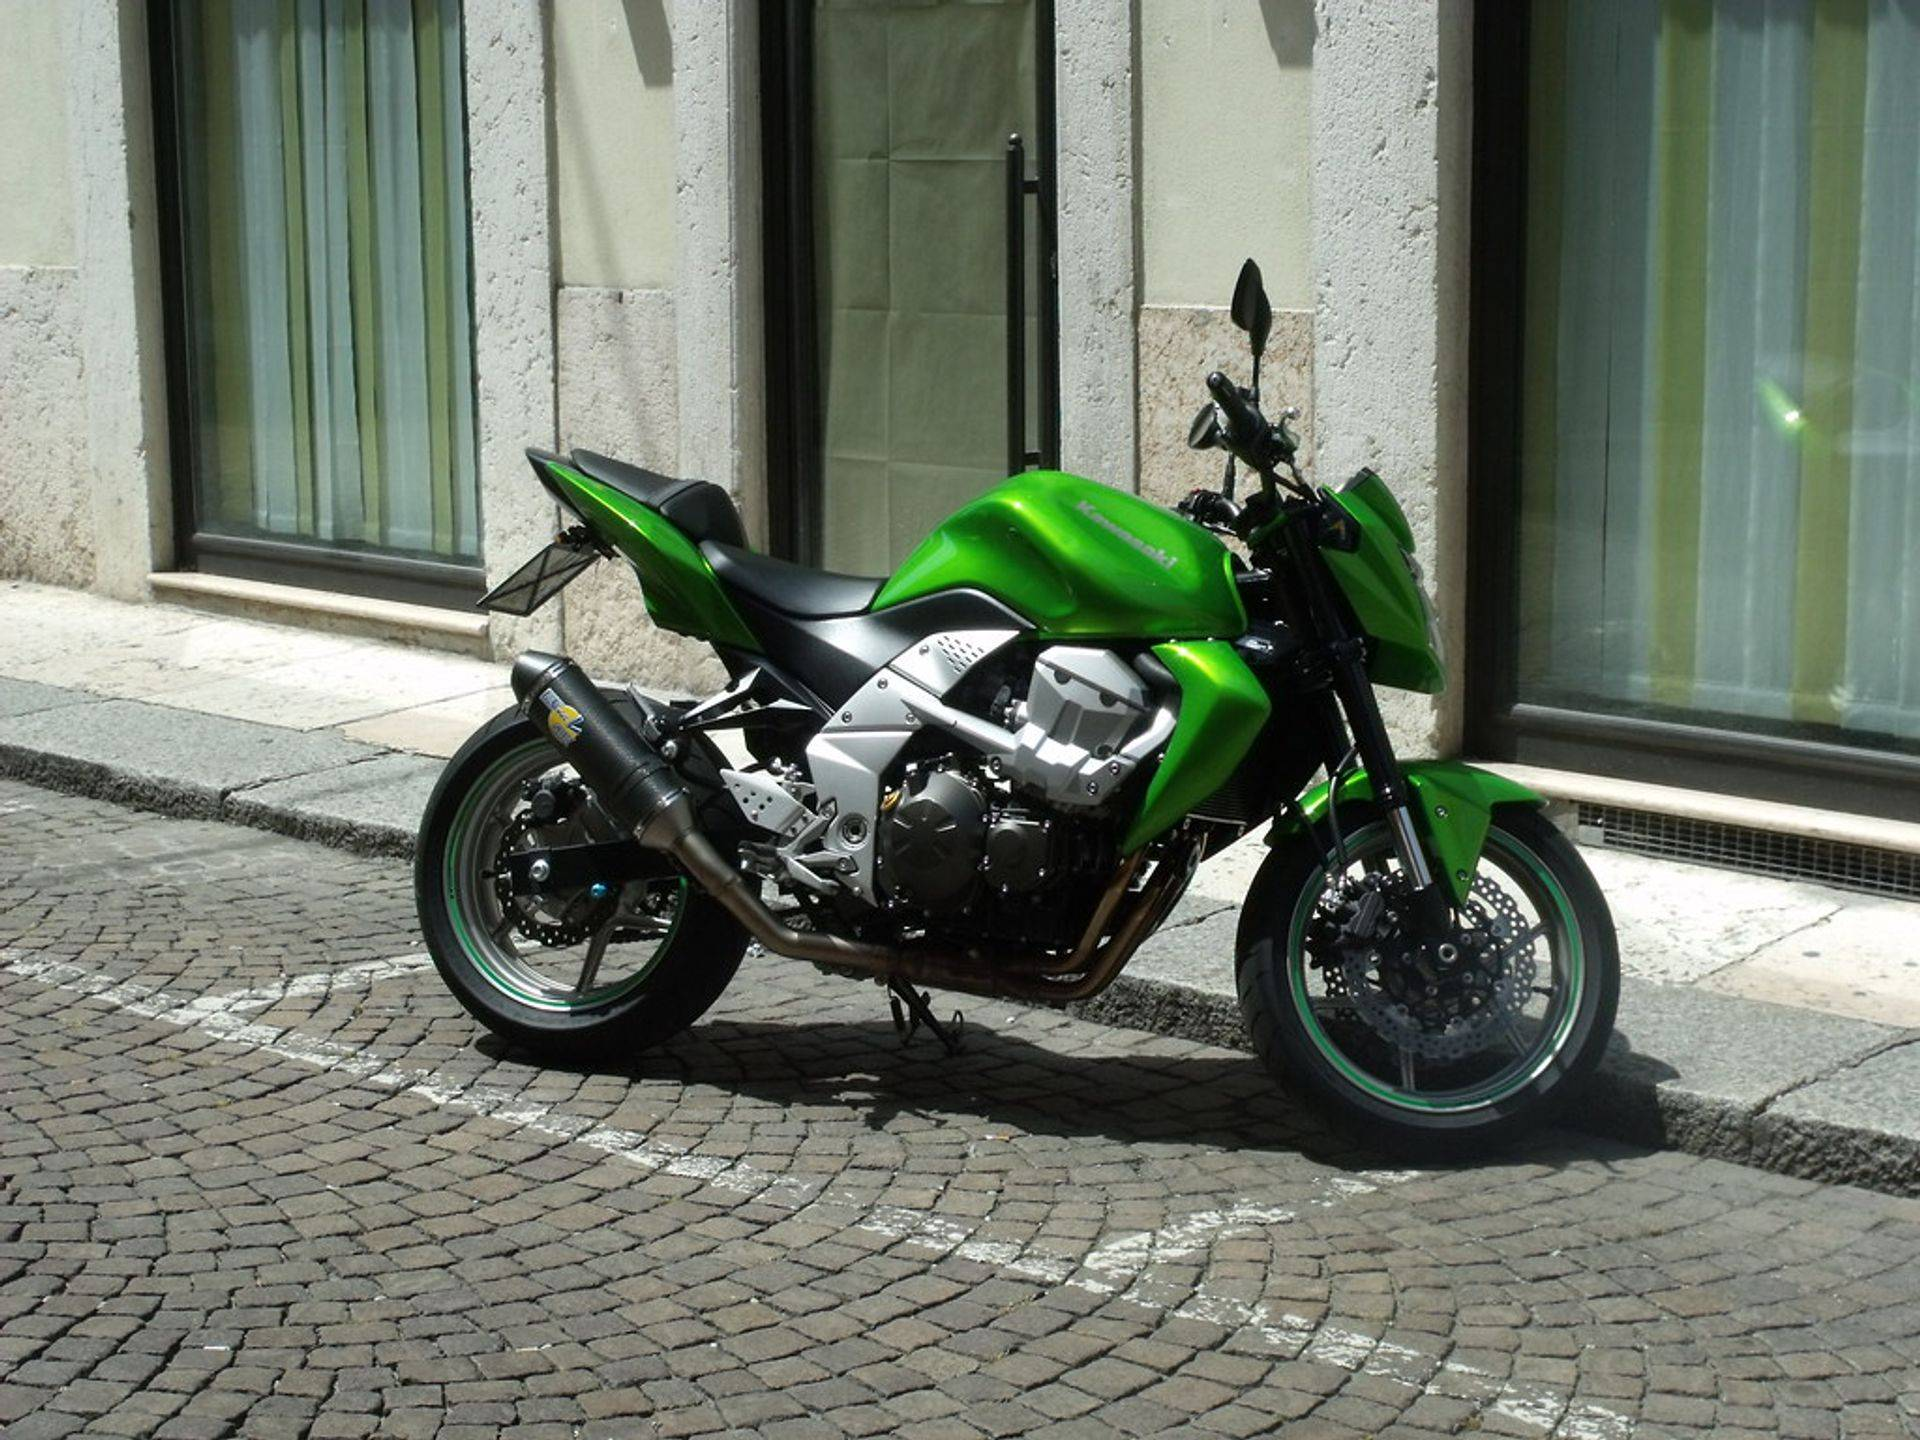 Slick Motorcycle